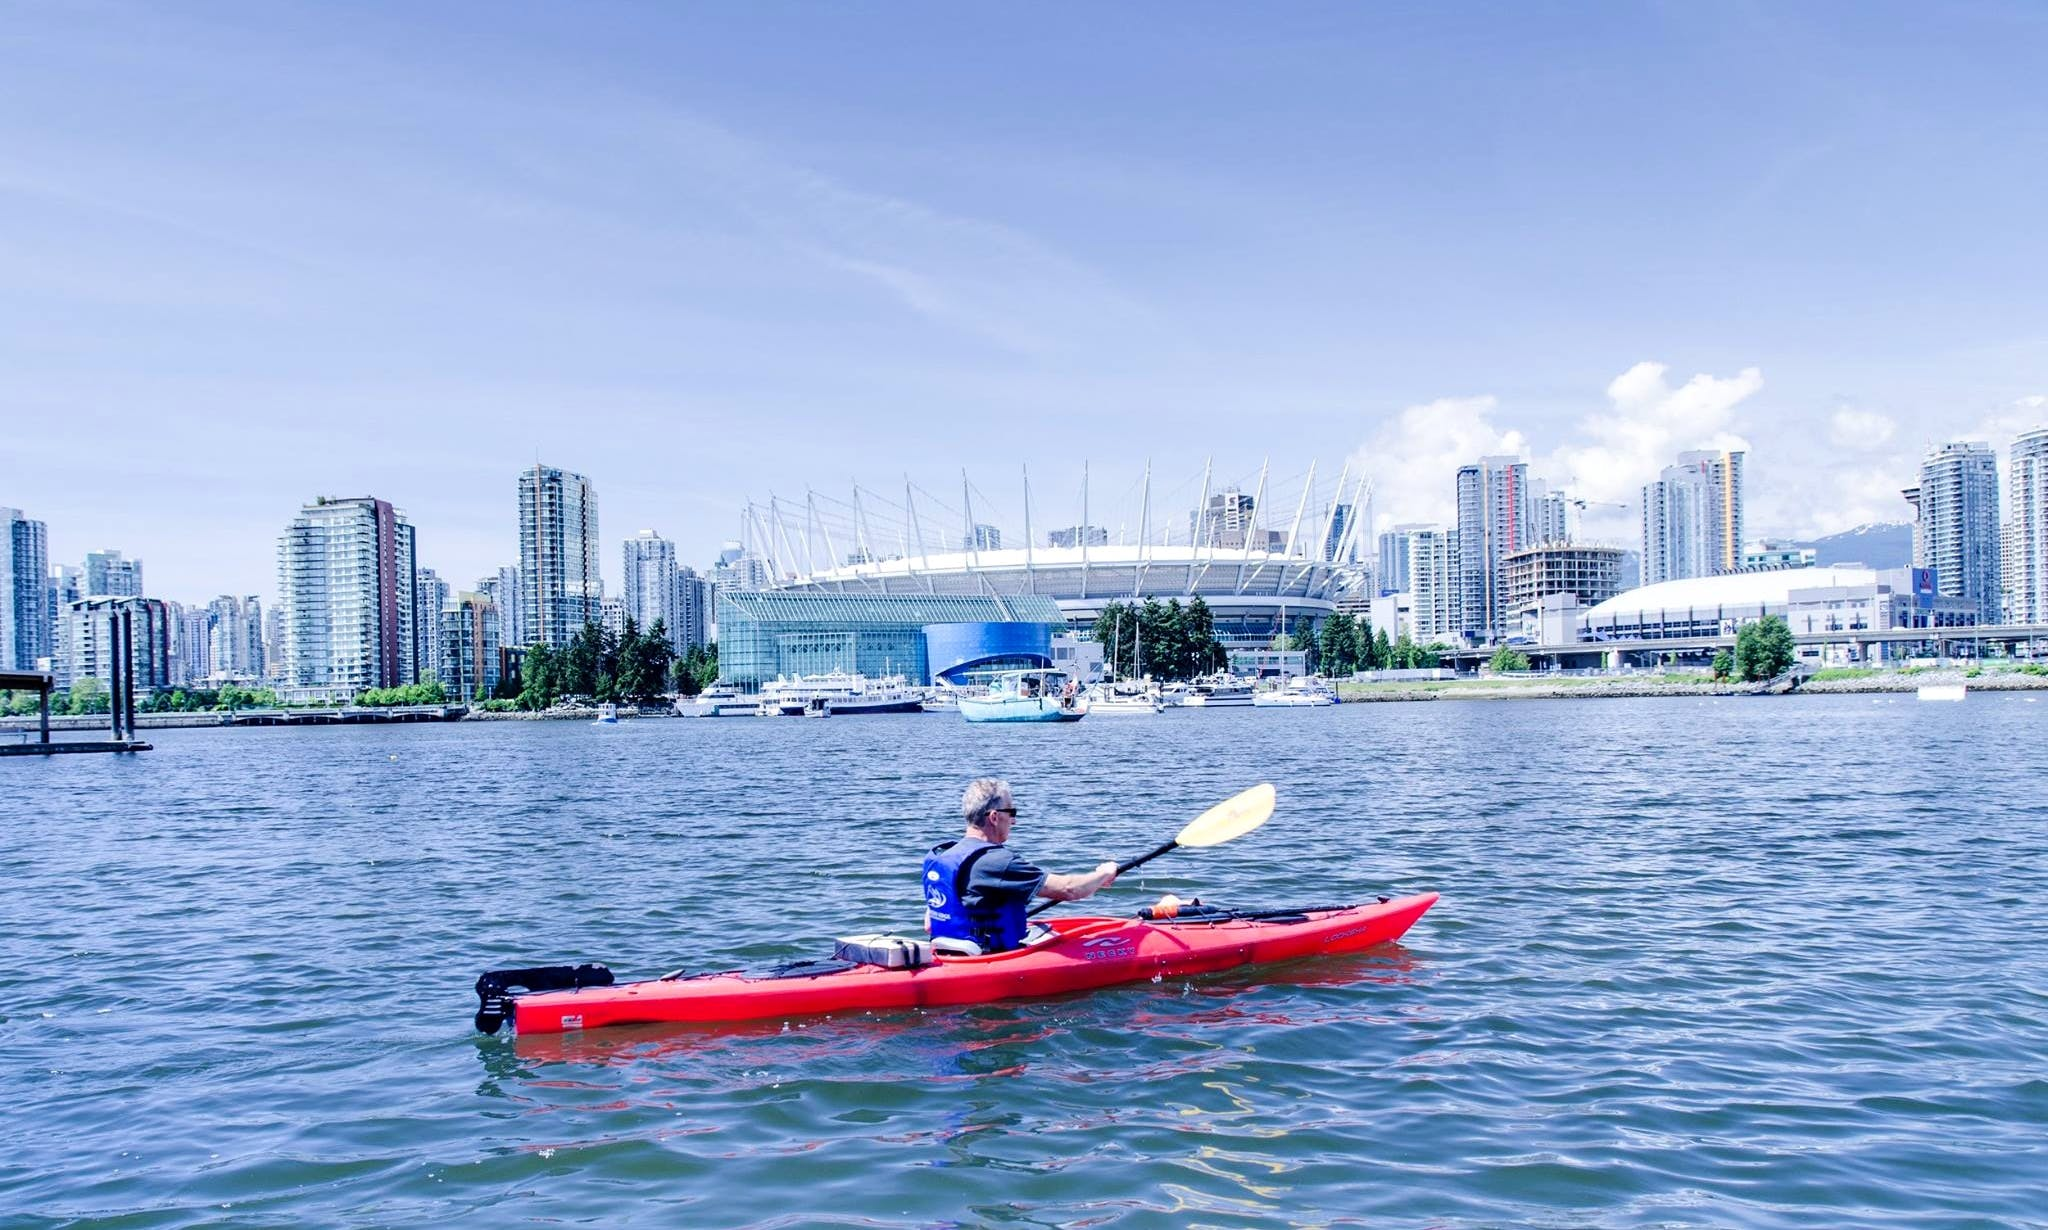 Tandem Kayak Rental with Life Jacket in Vancouver,  British Columbia